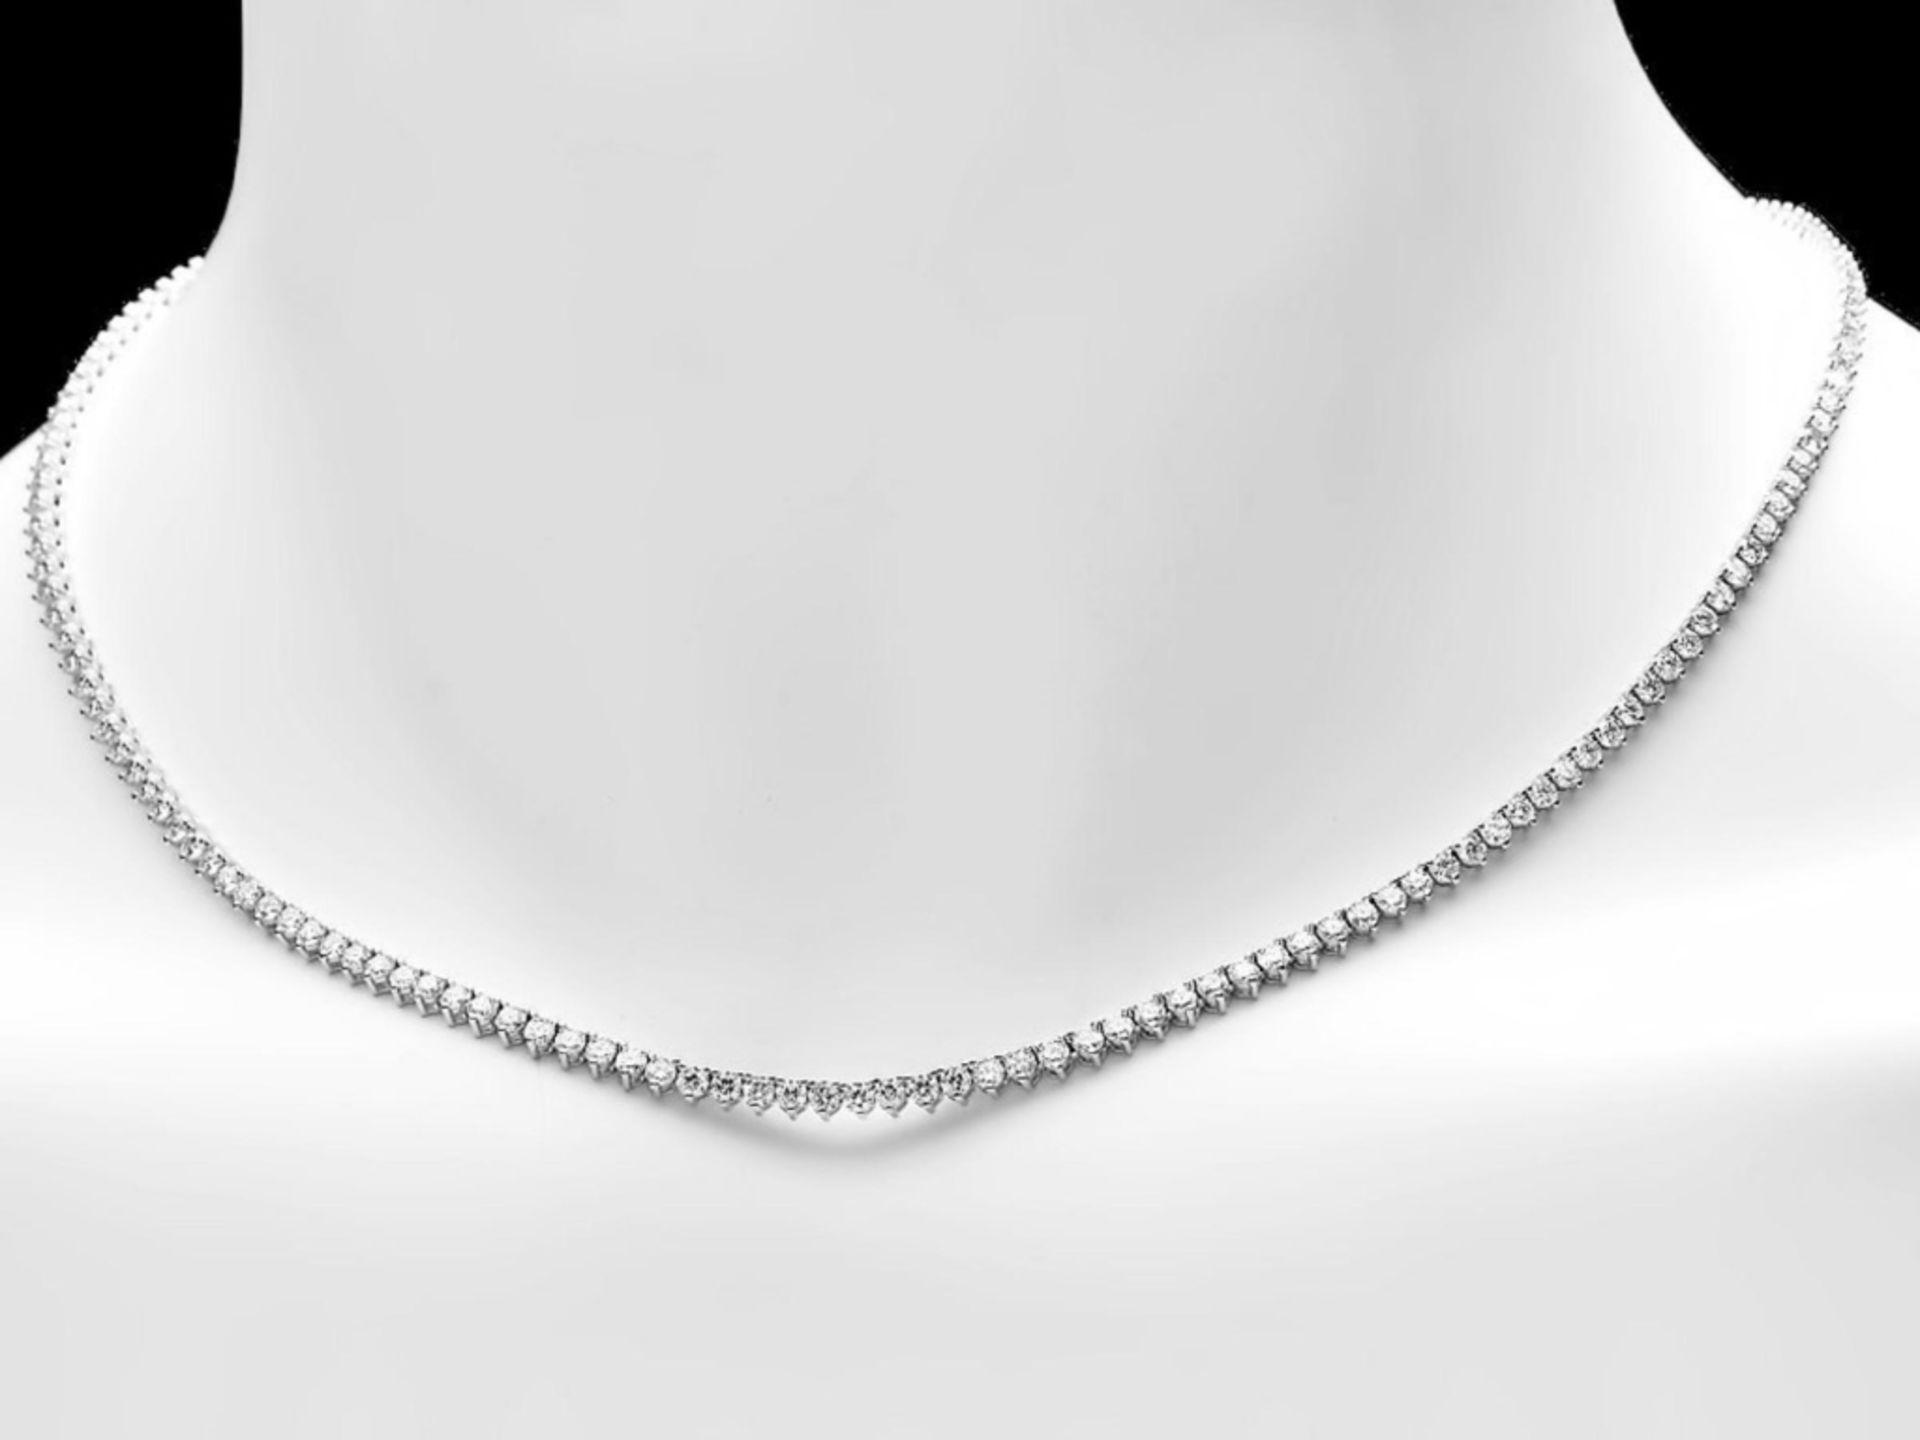 ^18k White Gold 8.00ct Diamond Necklace - Image 2 of 4